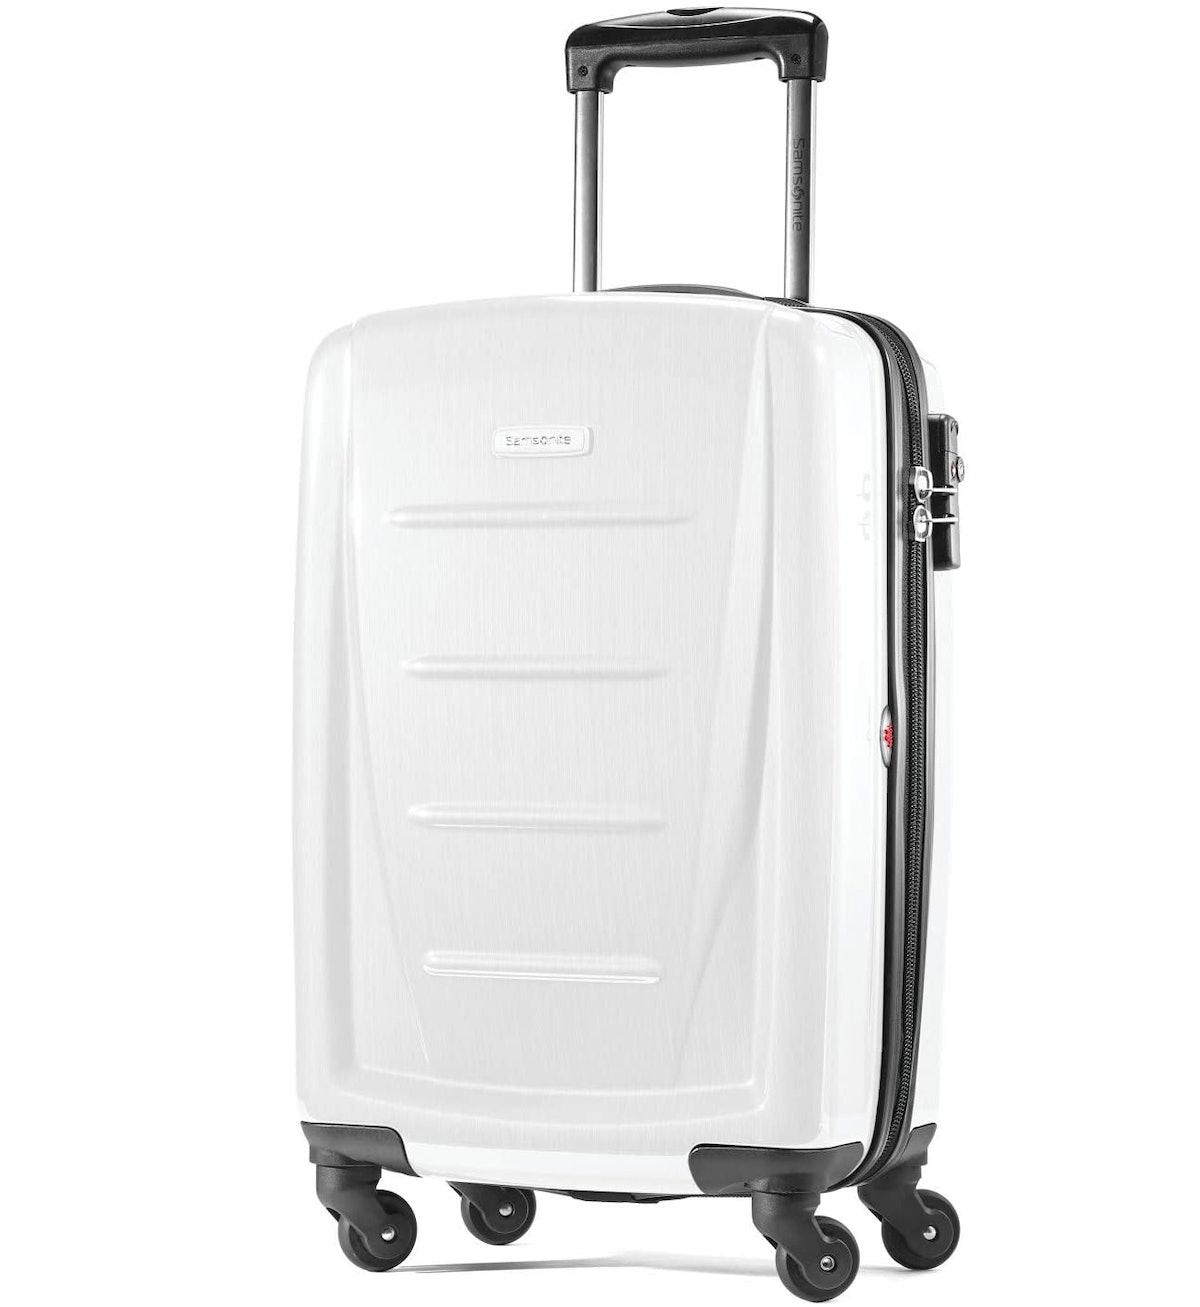 Samsonite Winfield 2 Hardside Expandable Luggage, 20-Inch